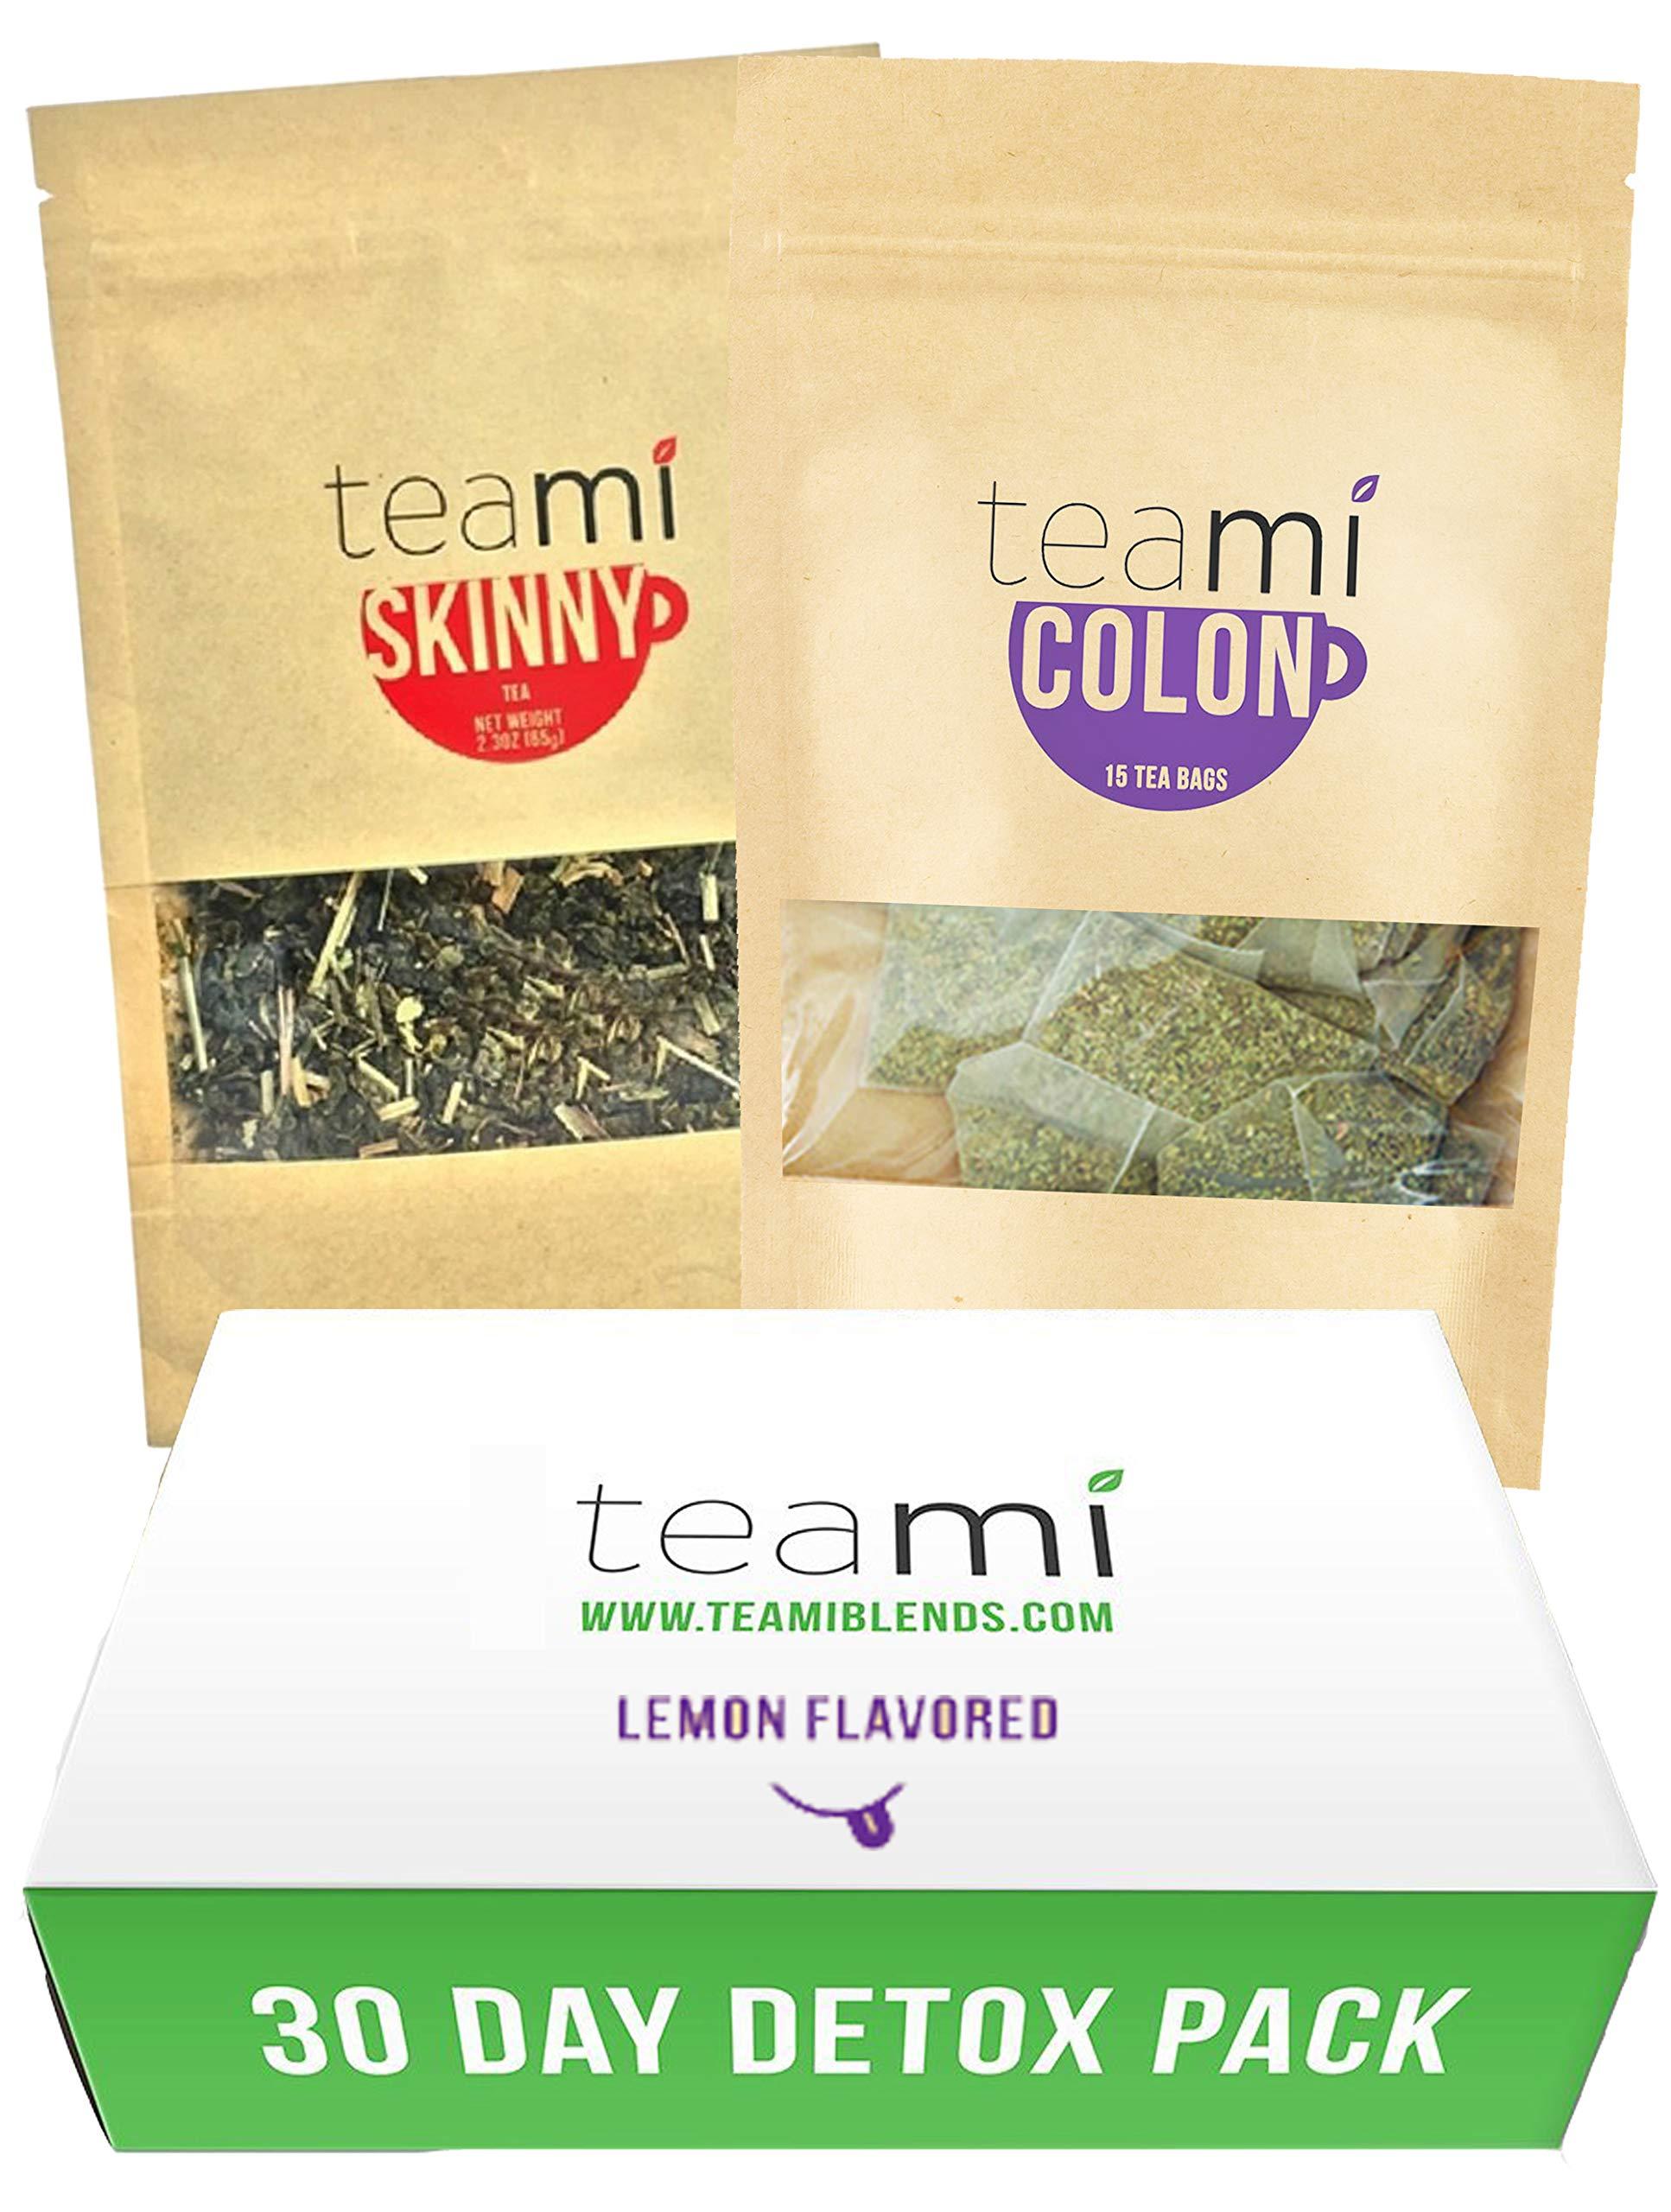 Teami® 30-Day Detox Tea Pack: All-Natural Teatox Kit with Teami Skinny & Teami Colon Cleanse Loose Leaf Herbal Teas (Lemon) by Teami